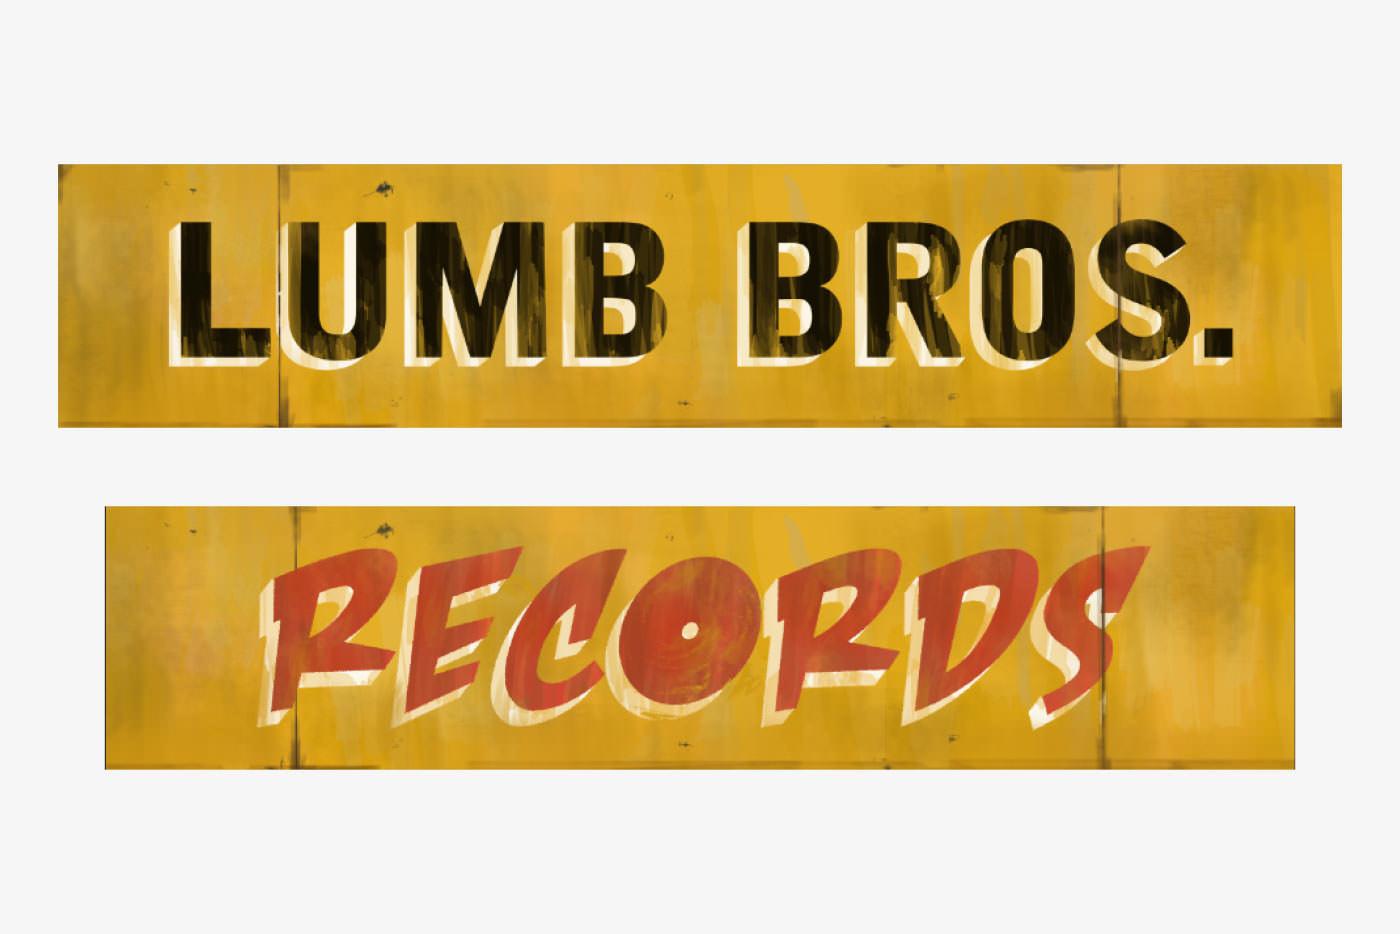 Record Shop Signage